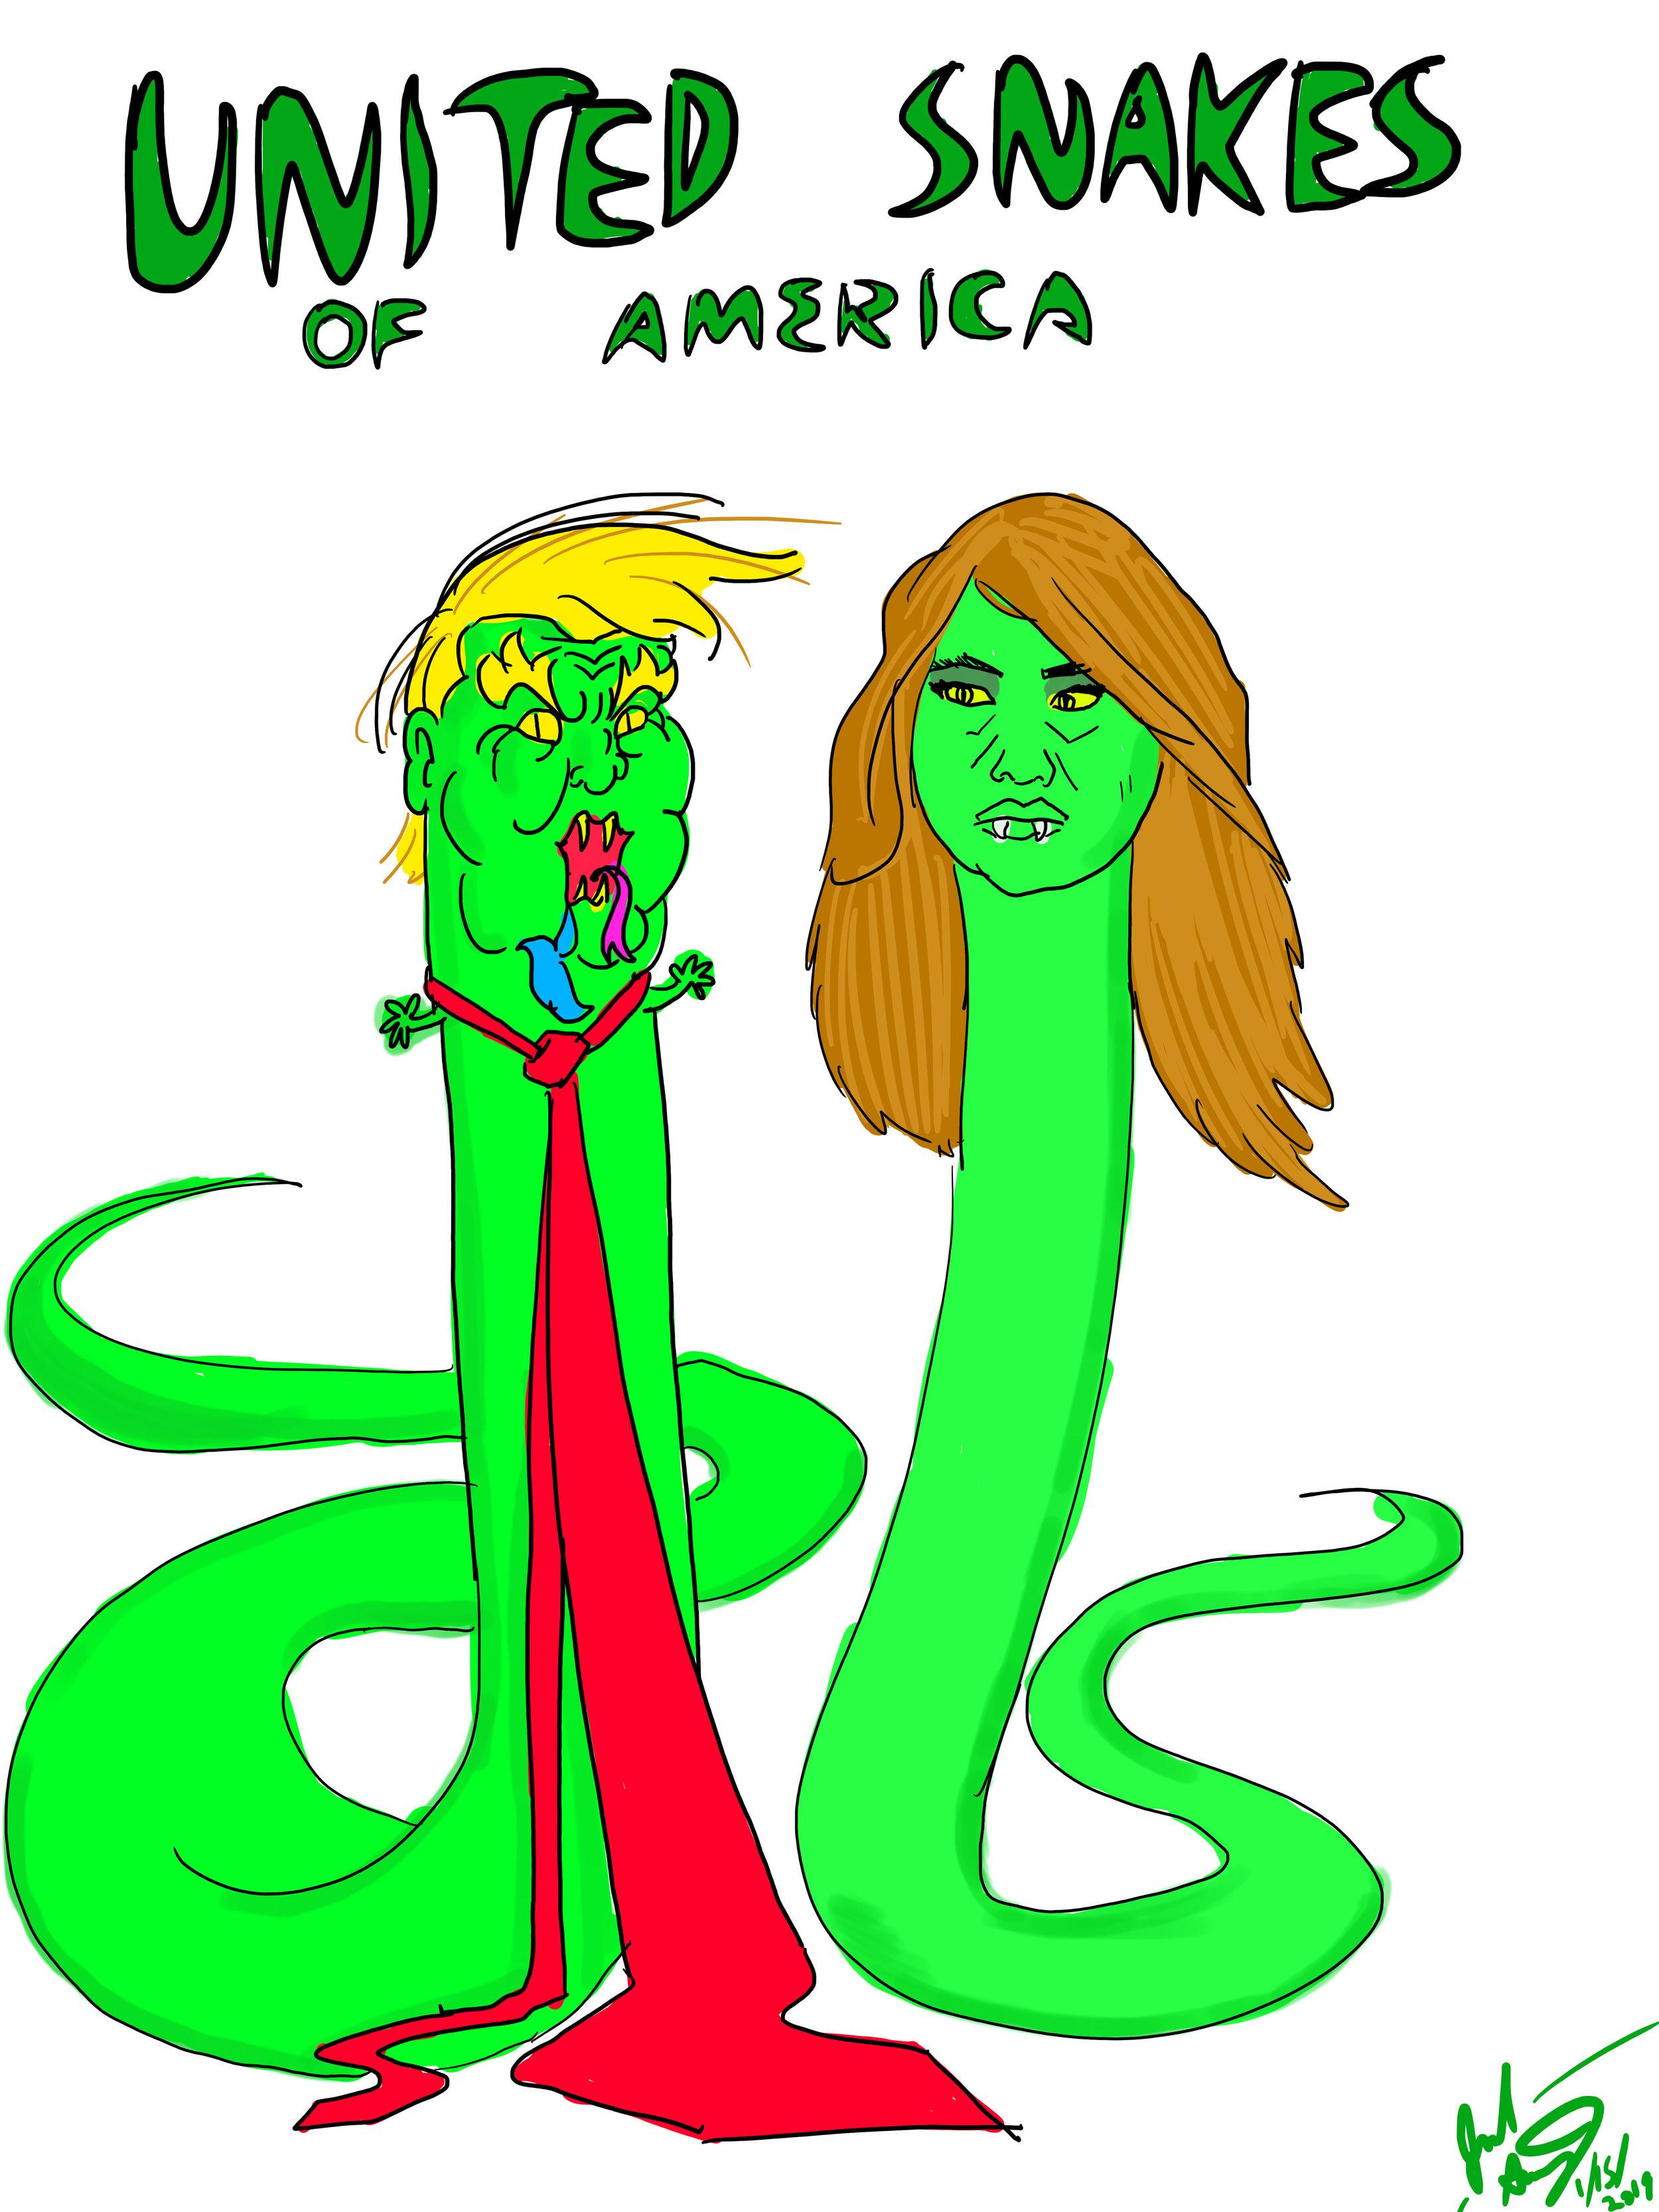 United Snakes of America